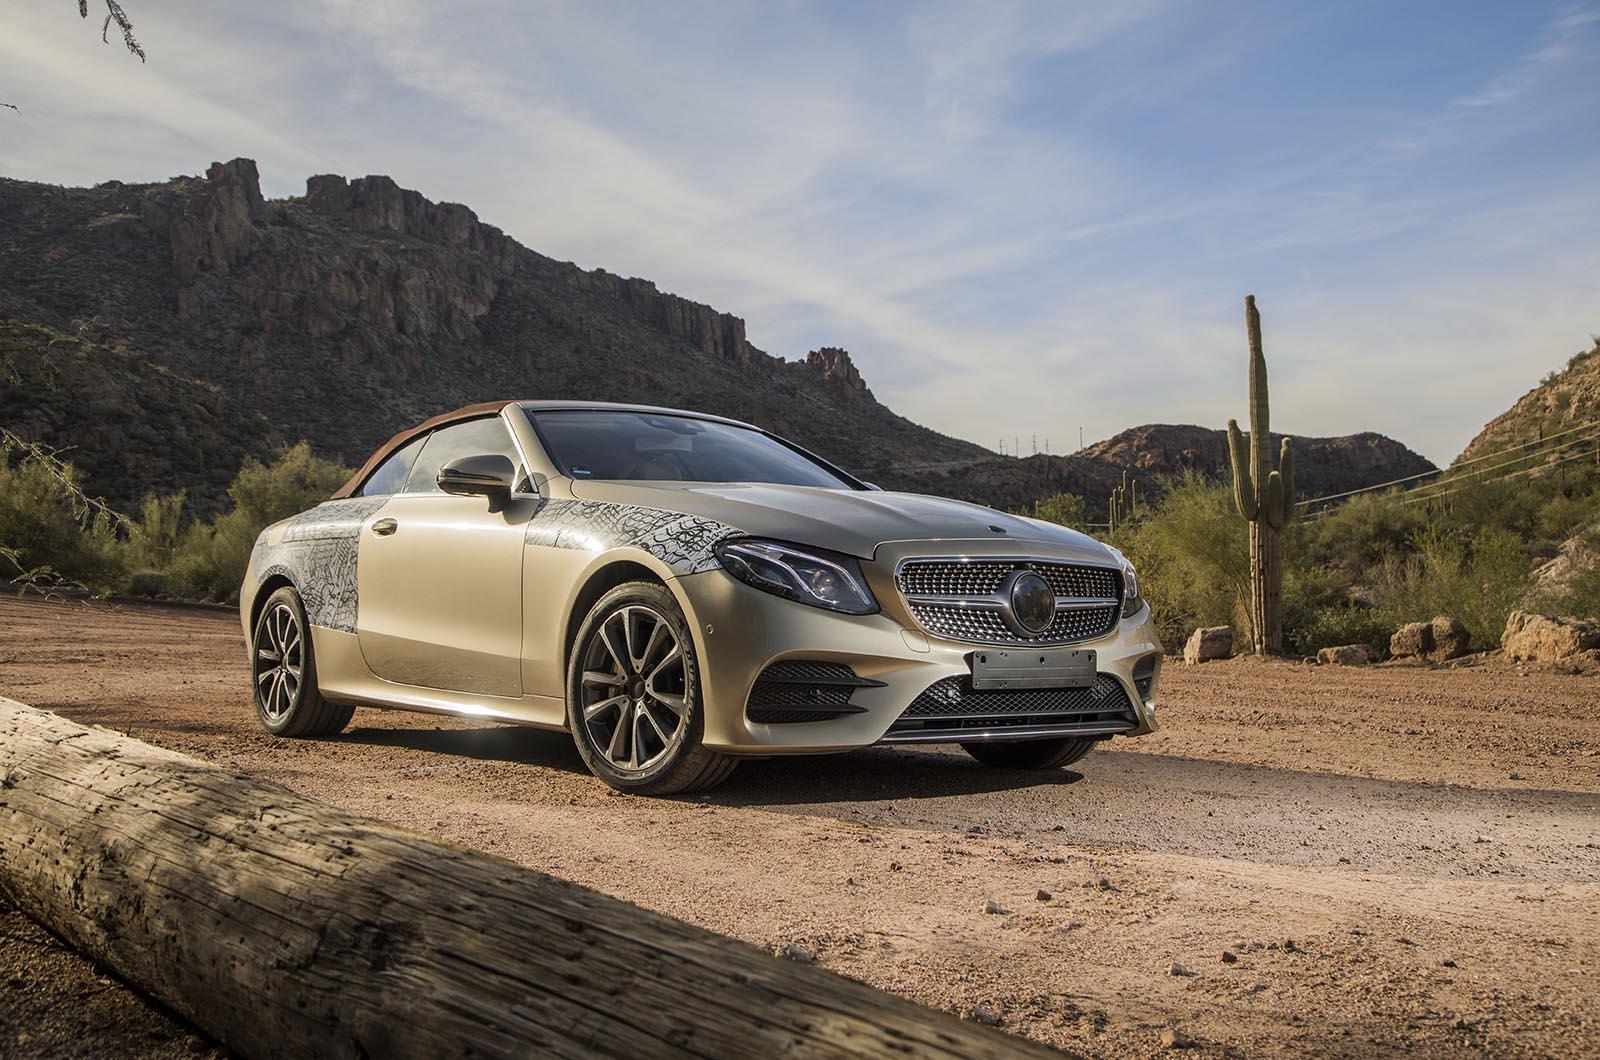 Mercedes-Benz E-Class: Cleaning the plastic trim